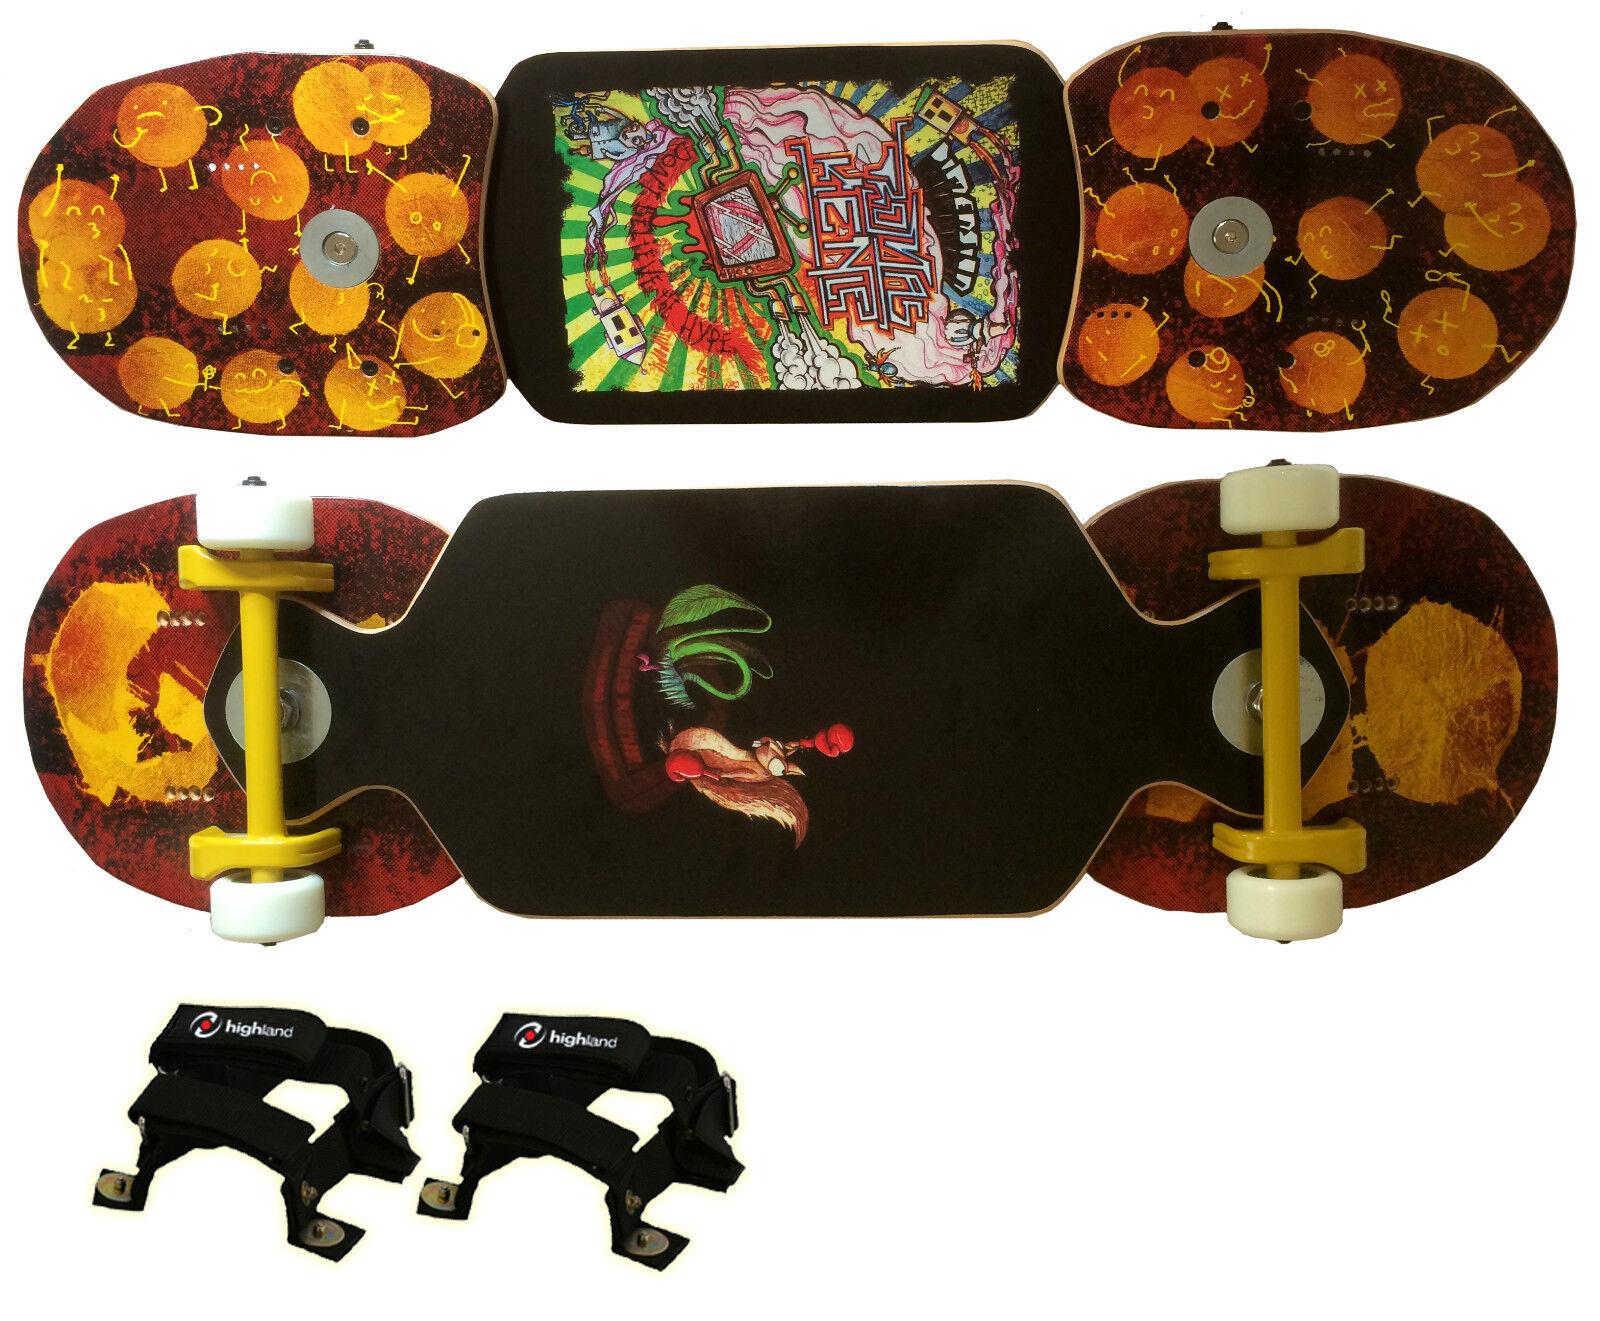 Ositos Custom Streetboard Coconuts, Dimension Thomas Kienle 55, Softcore Bindung